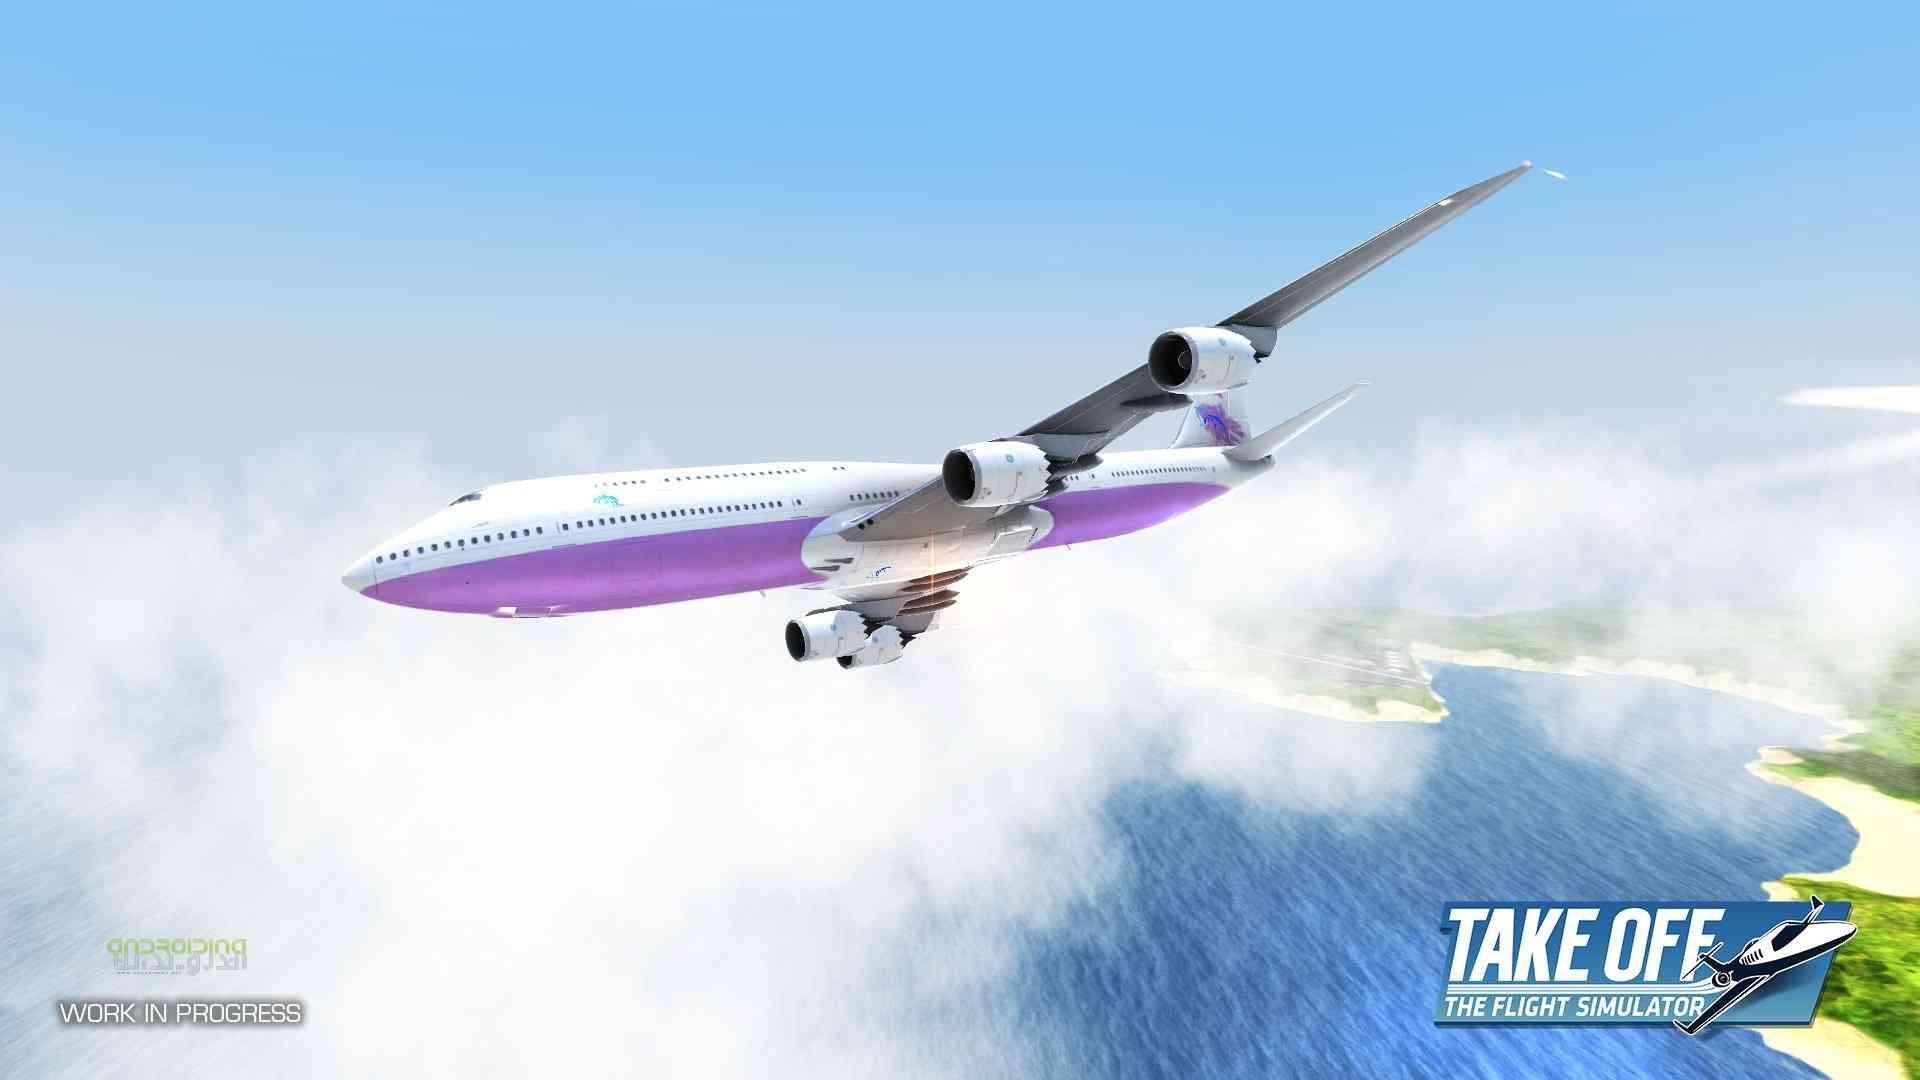 Take Off The Flight Simulator – شبیه سازی هواپیما